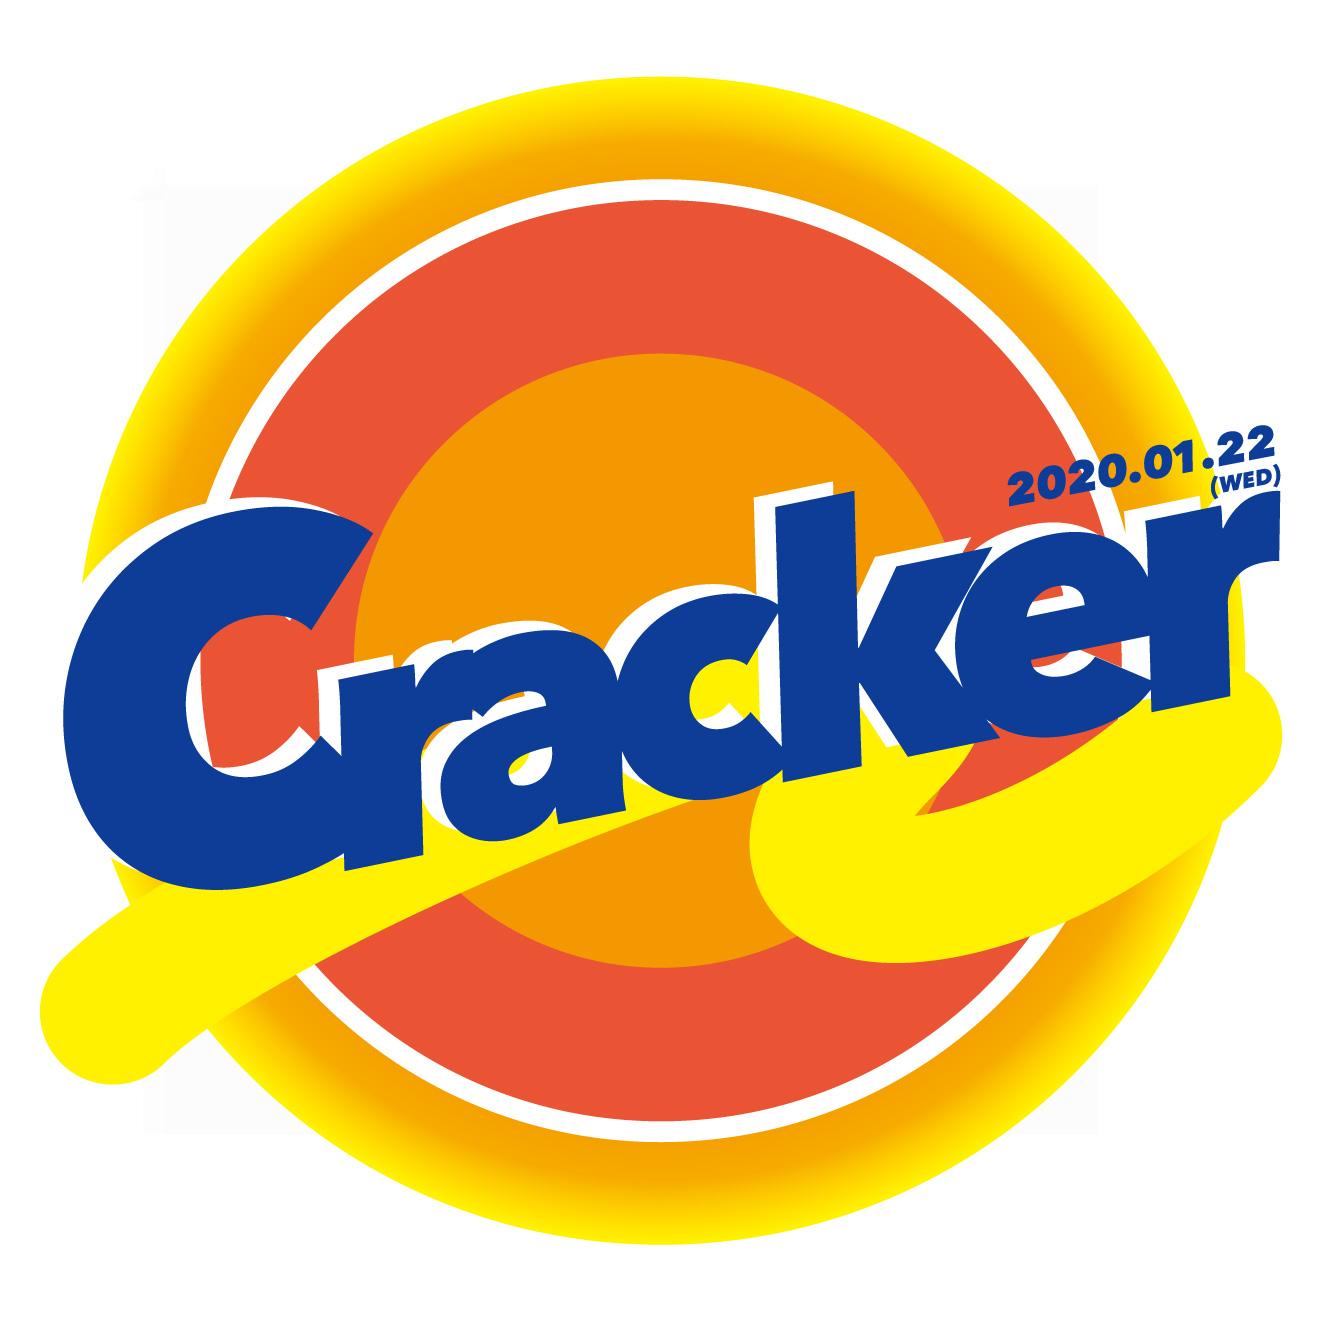 craker_200122_01